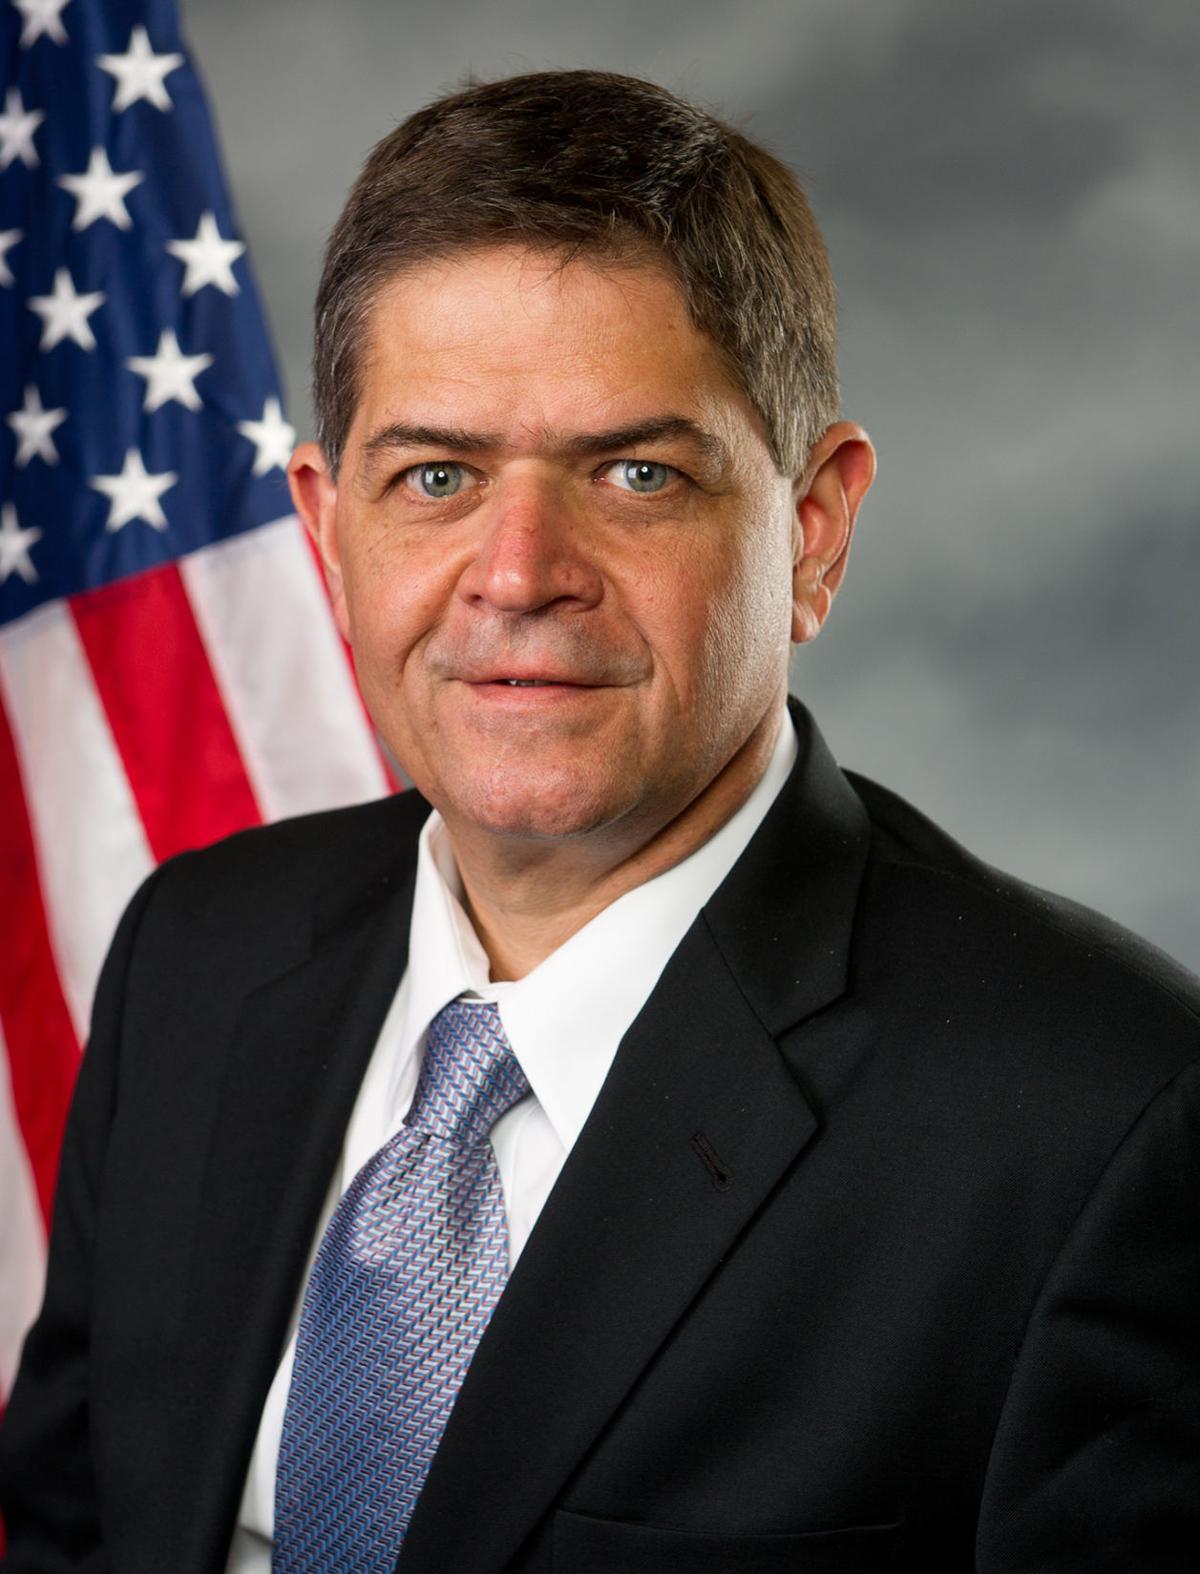 U.S. Rep. Filemon Vela